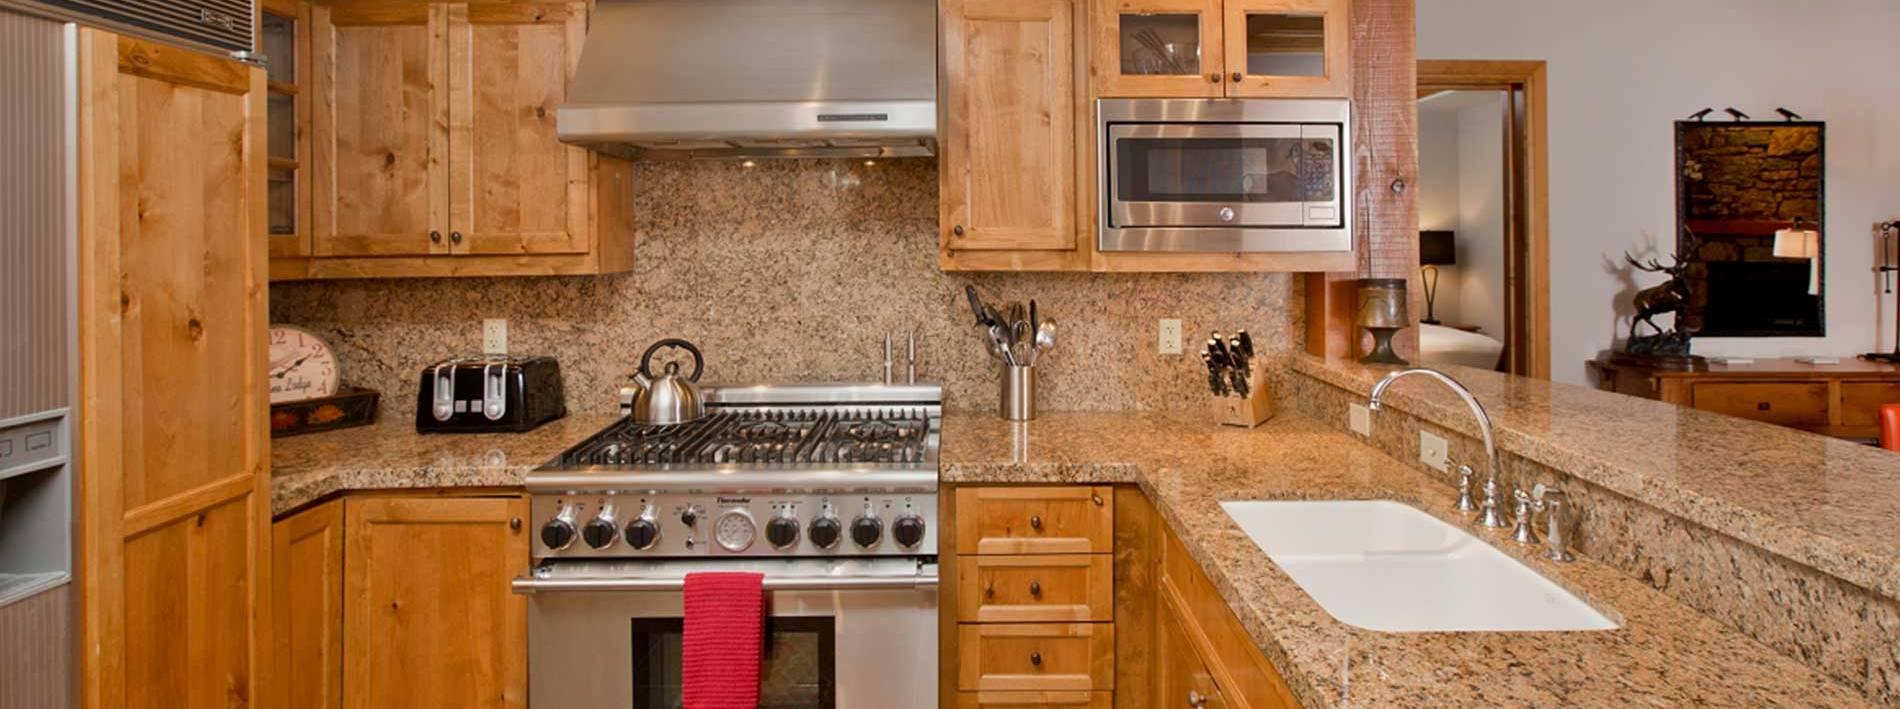 Pathfinder private home rental large kitchen